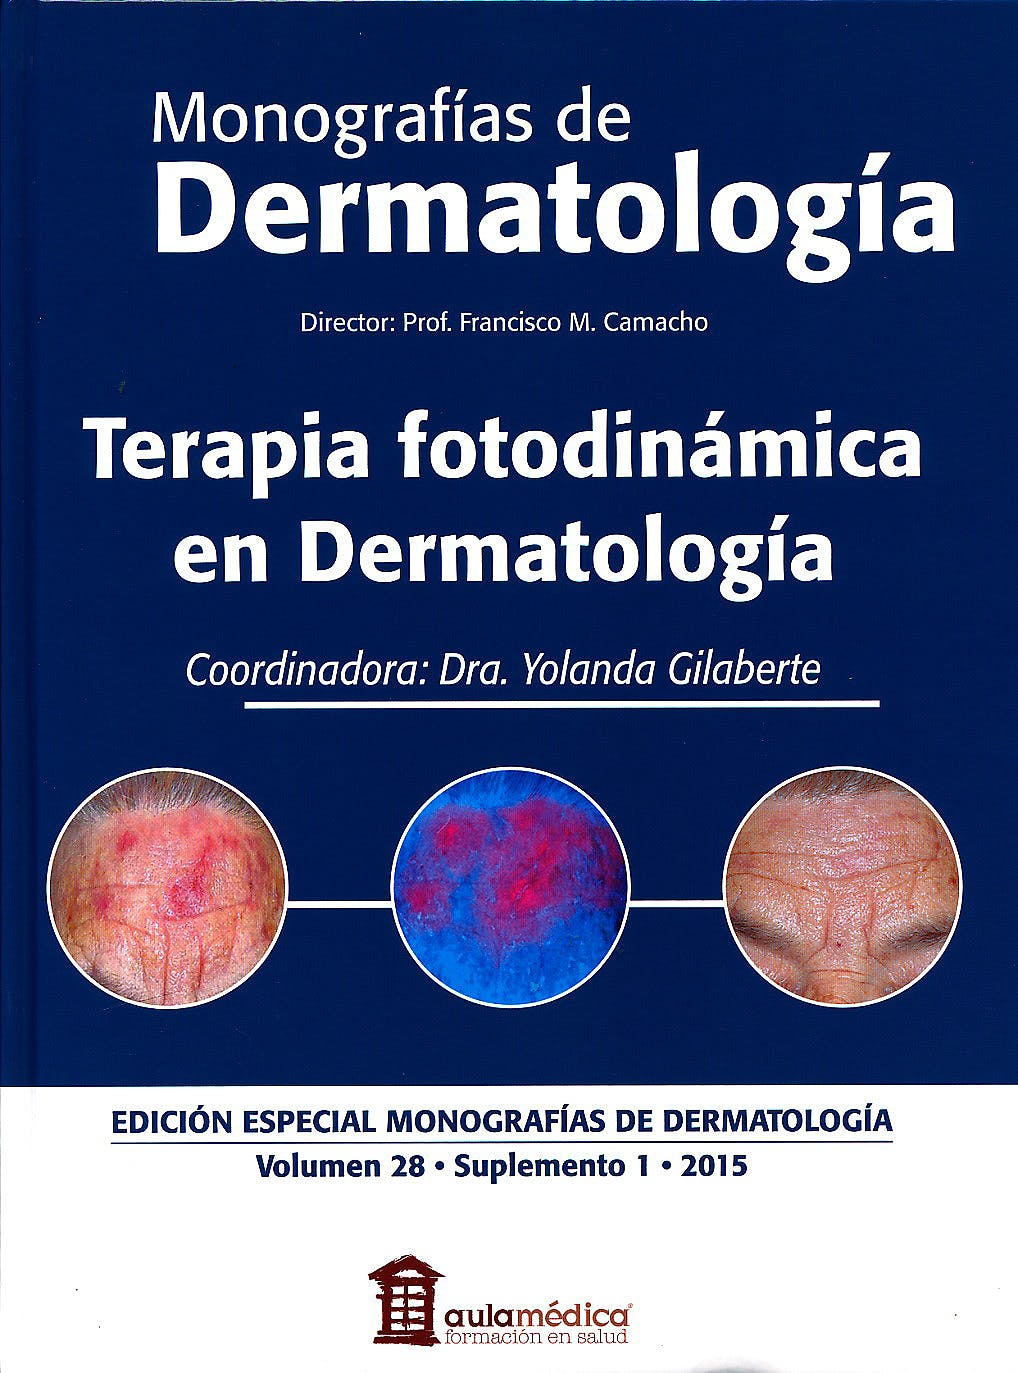 Portada del libro 9788478855834 Monografias de Dermatologia: Terapia Fotodinamica en Dermatologia. Vol. 28 Suplemento 1